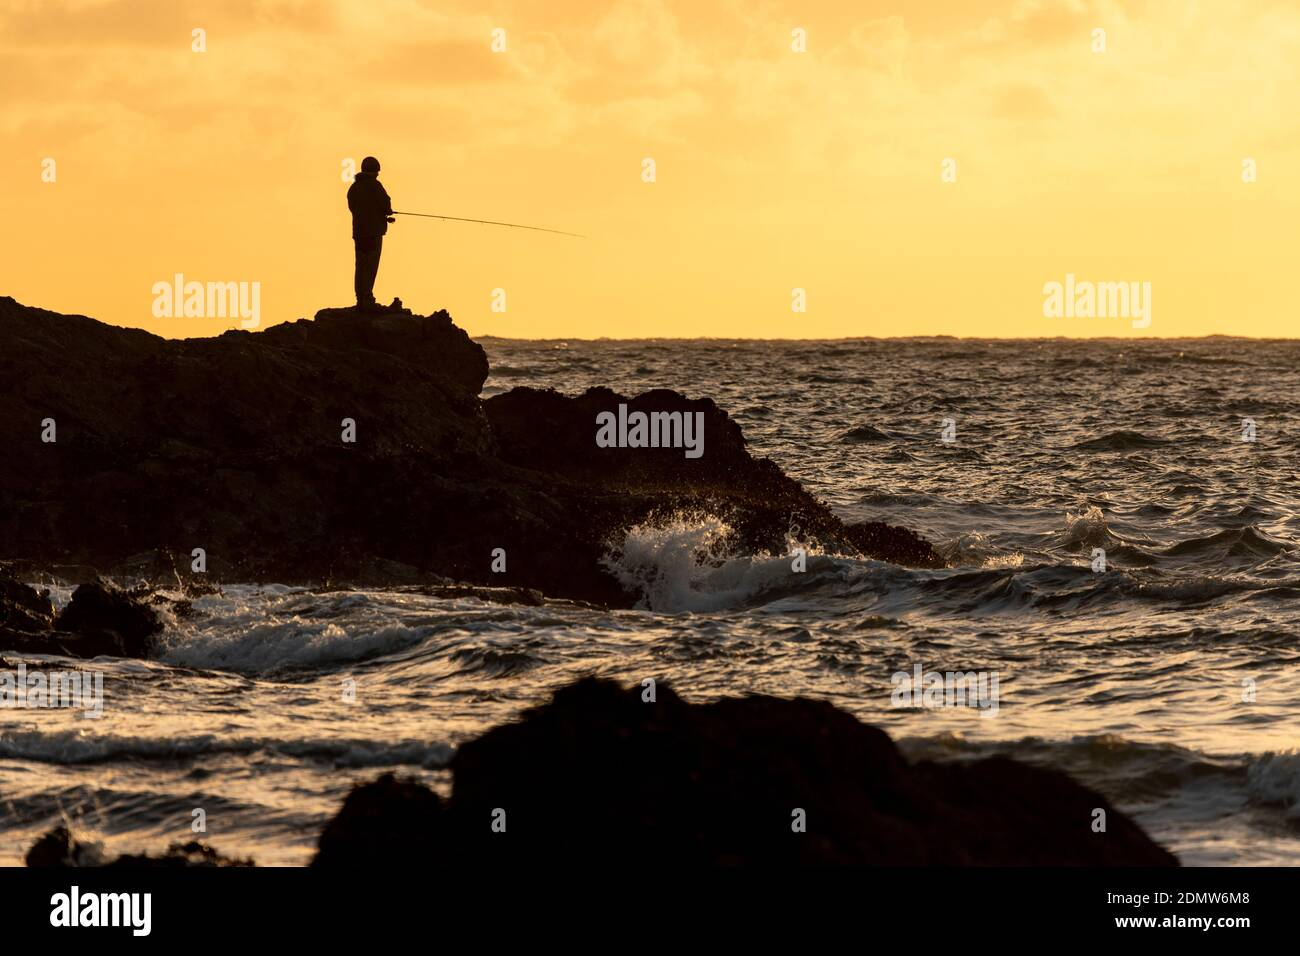 Sea angler at Porth Dafarch, Anglesey, North Wales Stock Photo